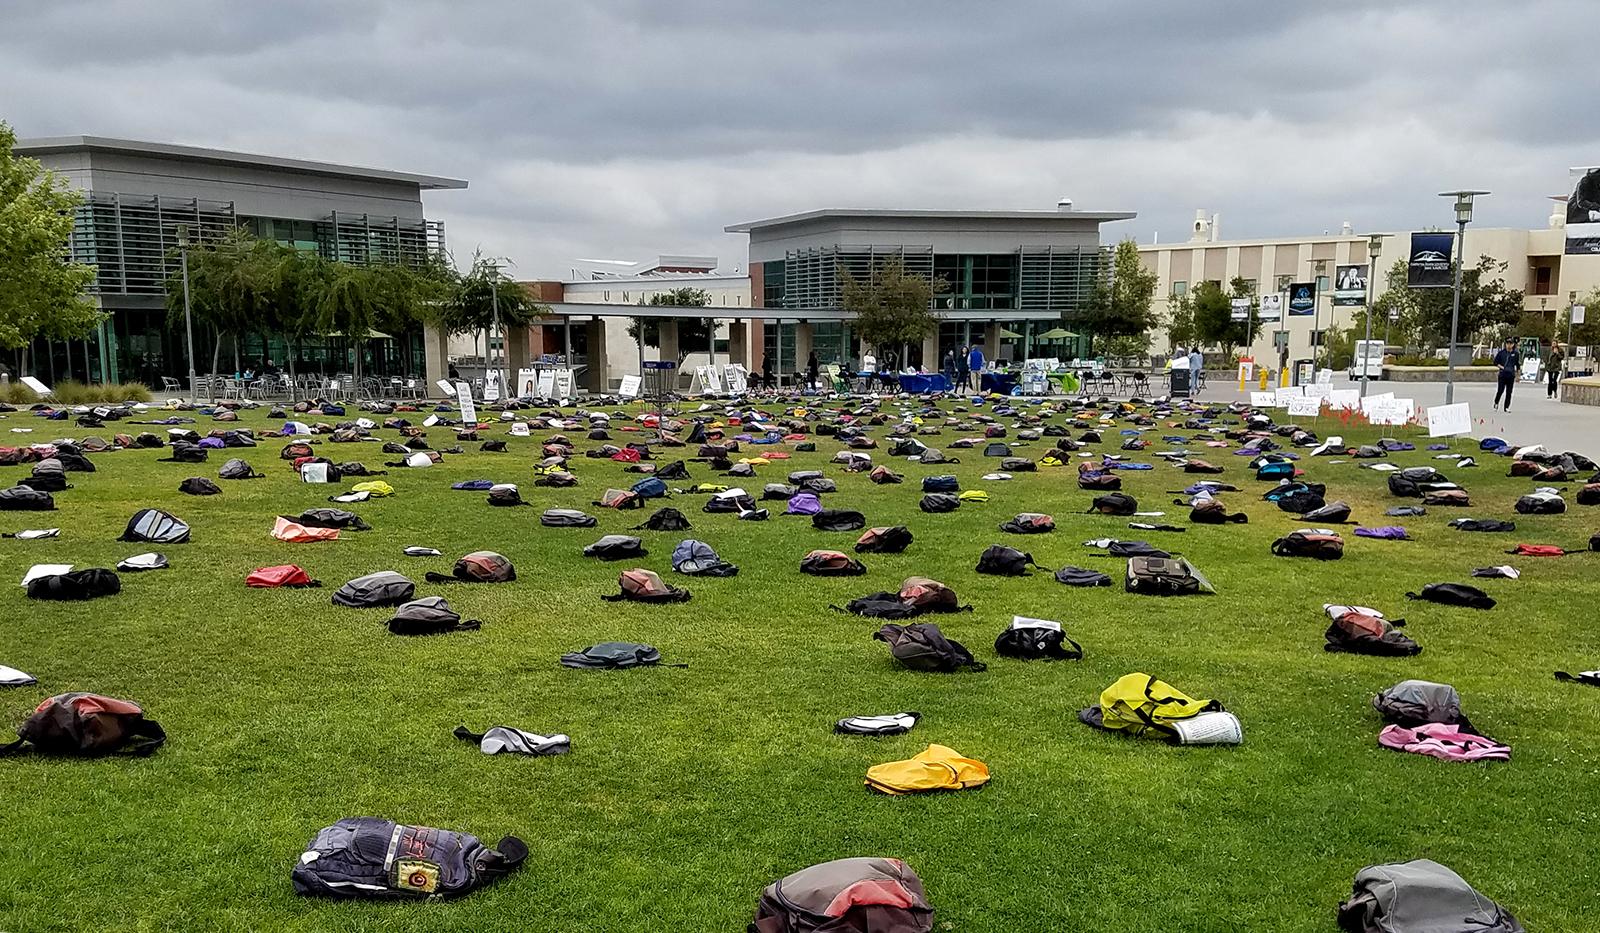 Send Silence Packing exhibit at California State University San Marcos.